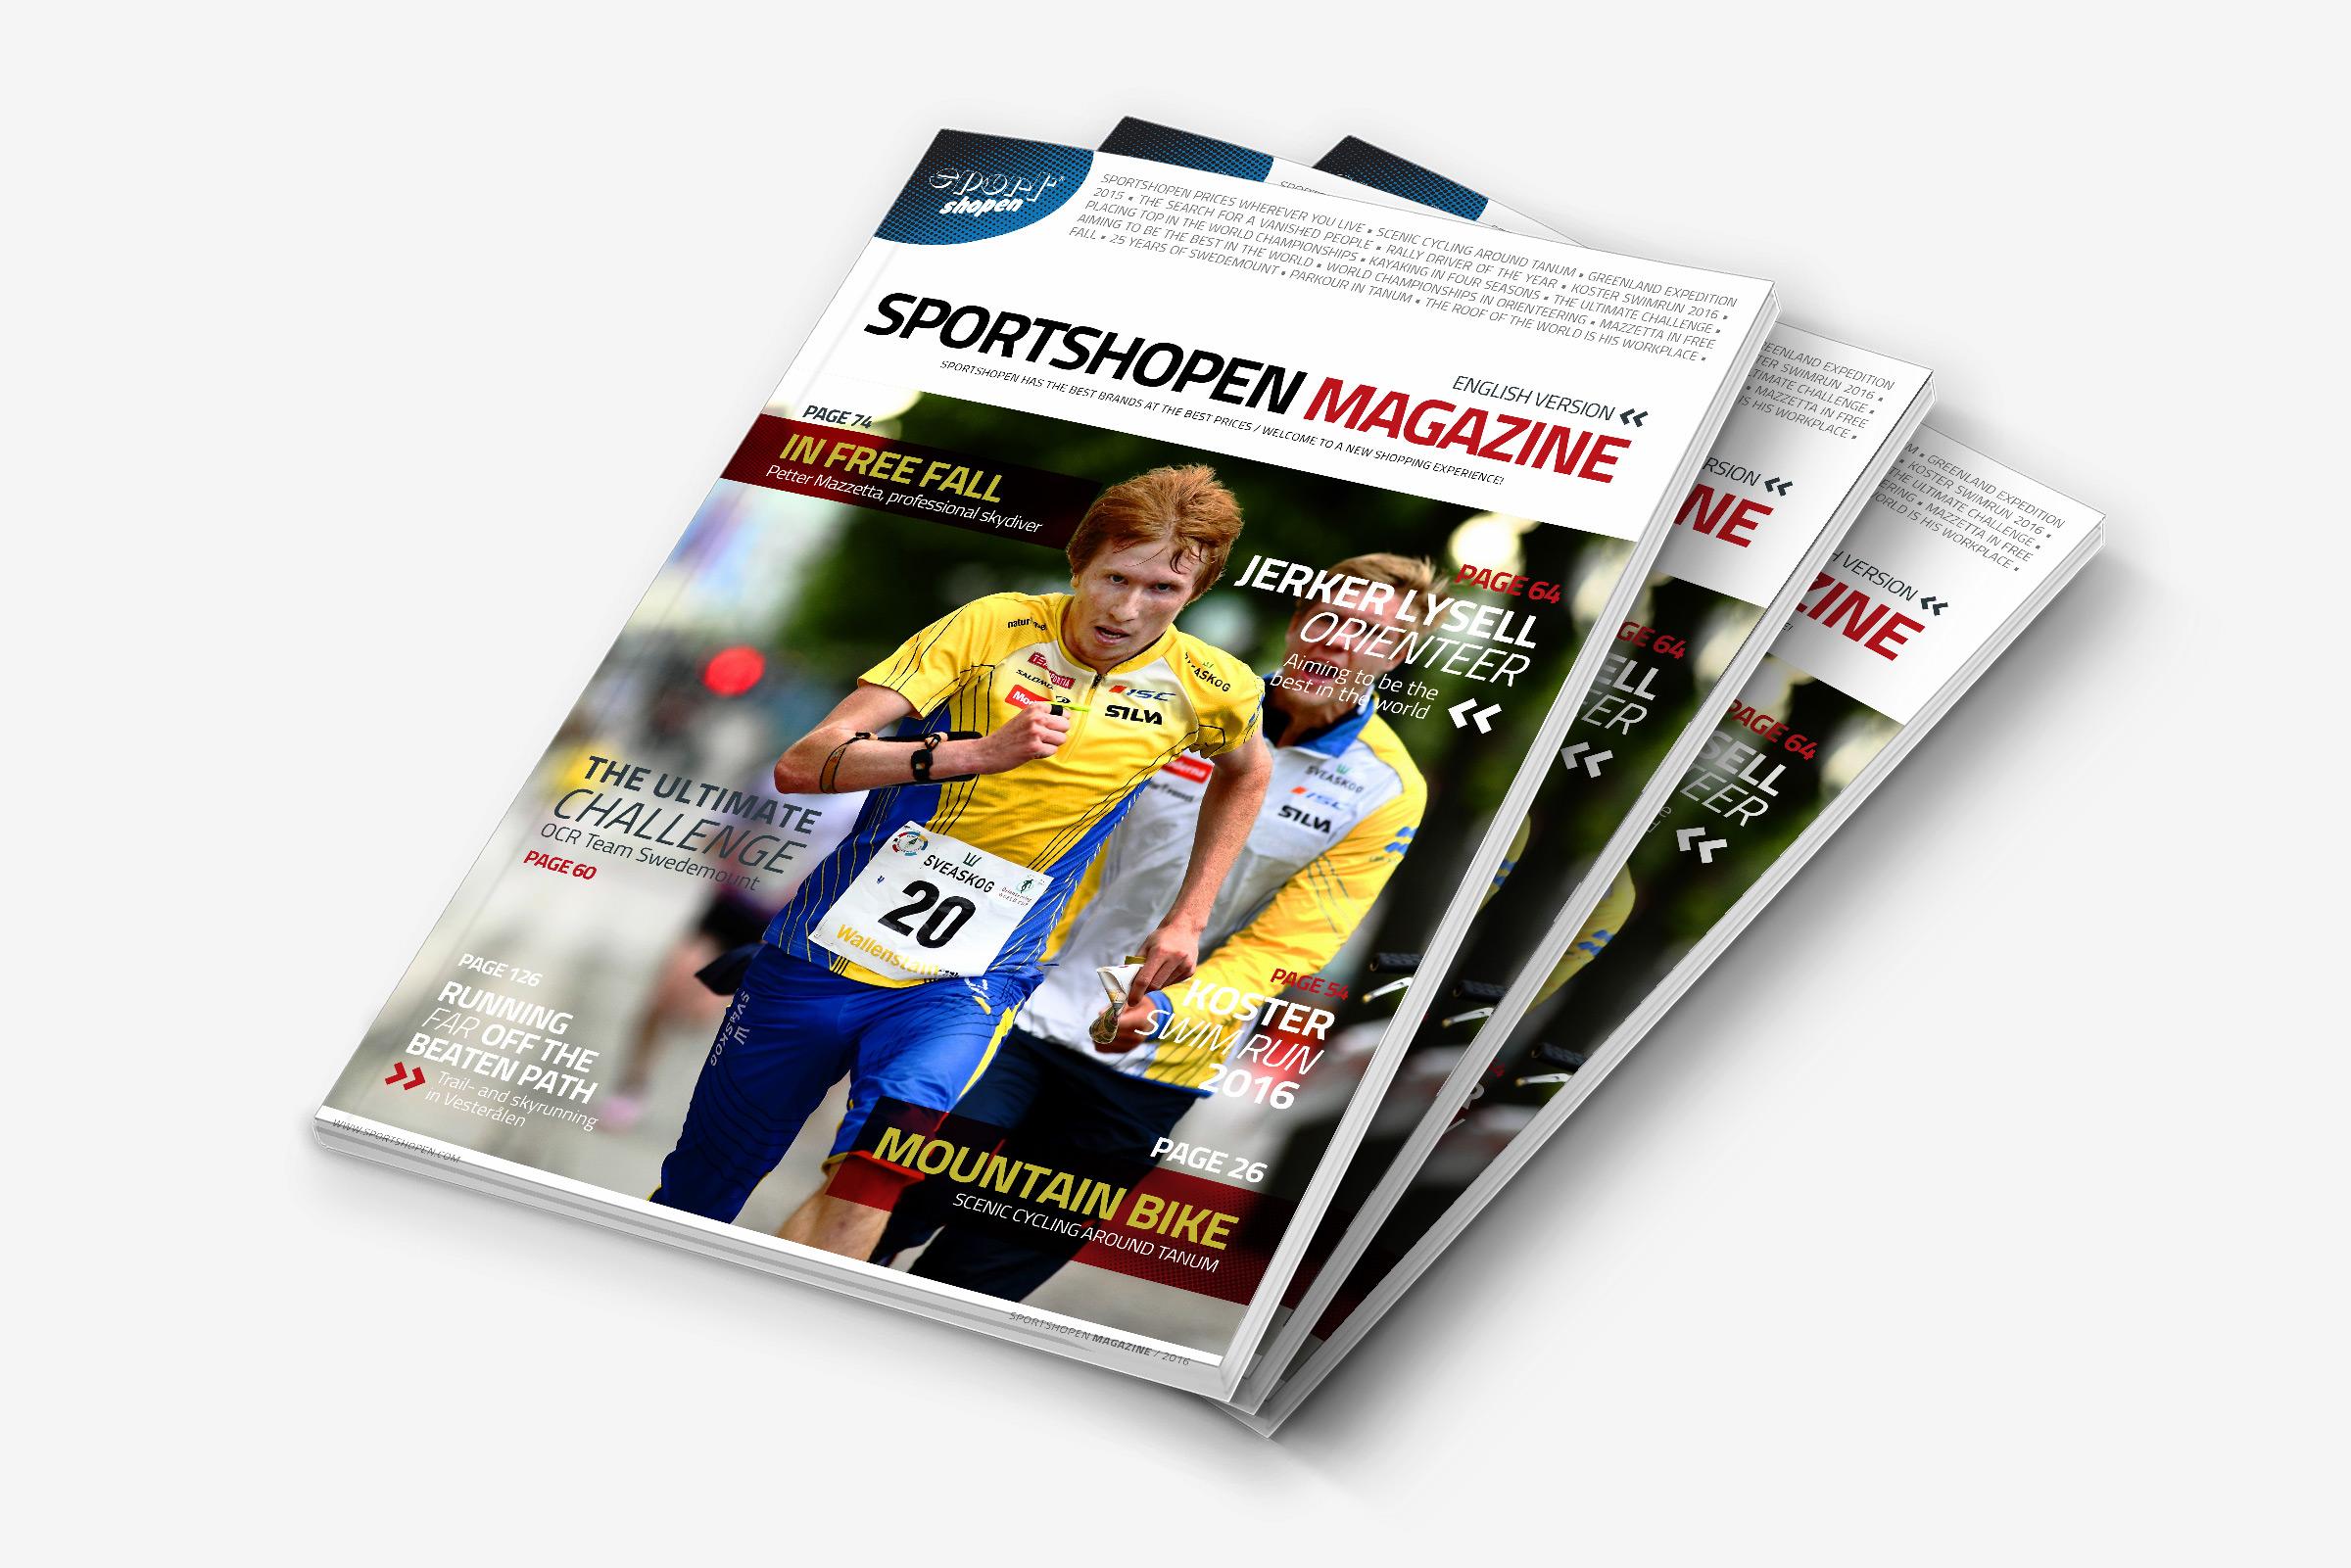 Sportshopen Magazine